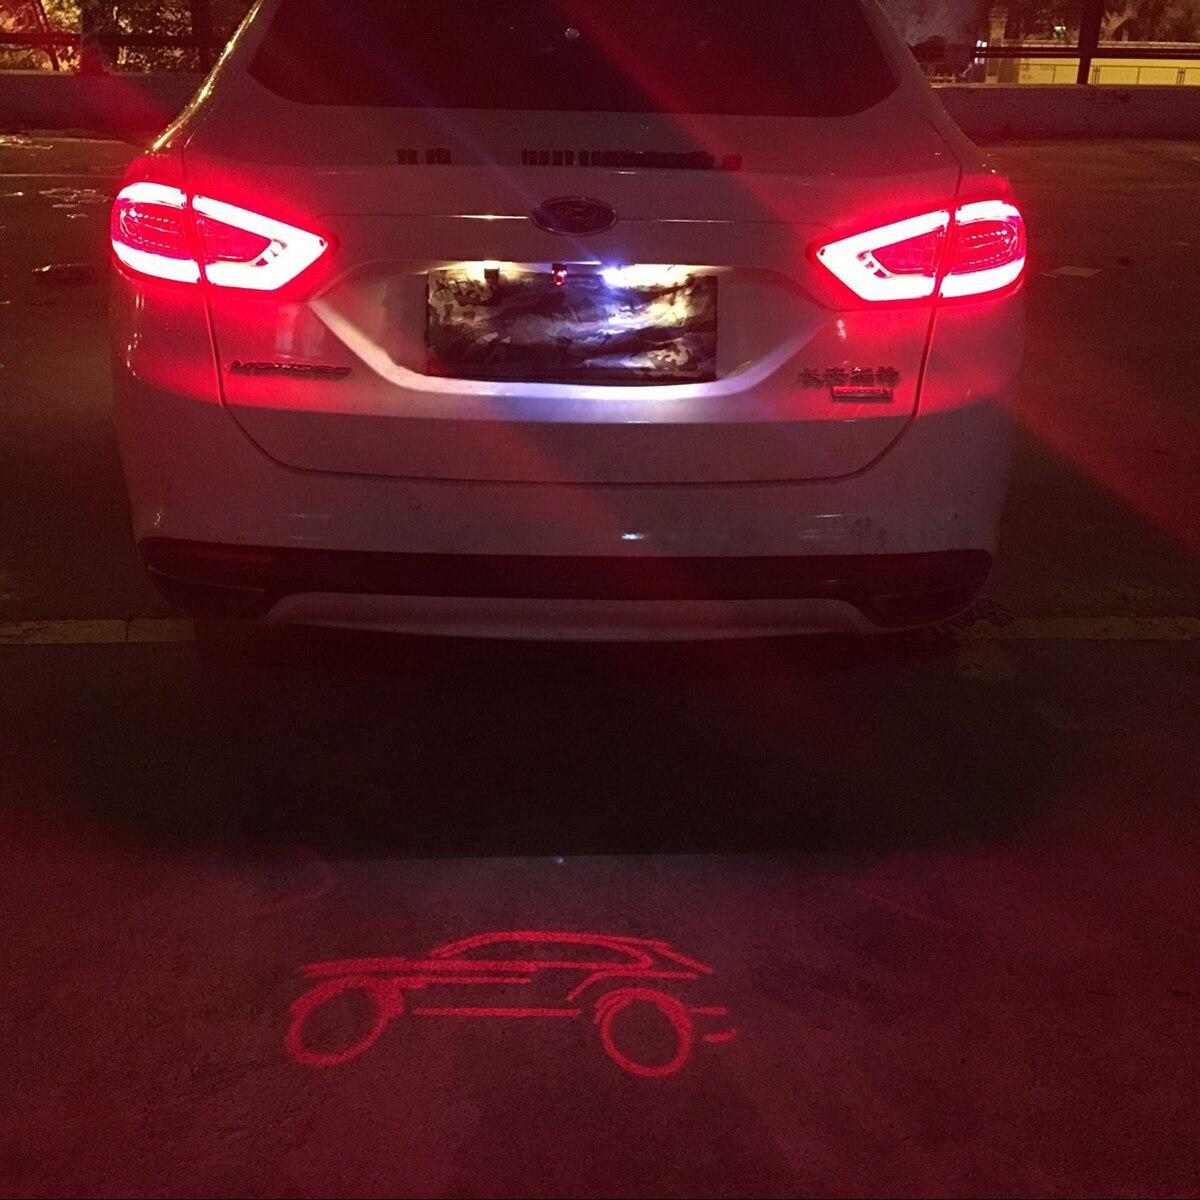 Car Laser Tail Led Light Anti Collision Rear-end Fog Lamp Rearing Warning Light for BMW E39 E46 E53 E90 E91 E92 E93 X5 X6 Logo<br><br>Aliexpress